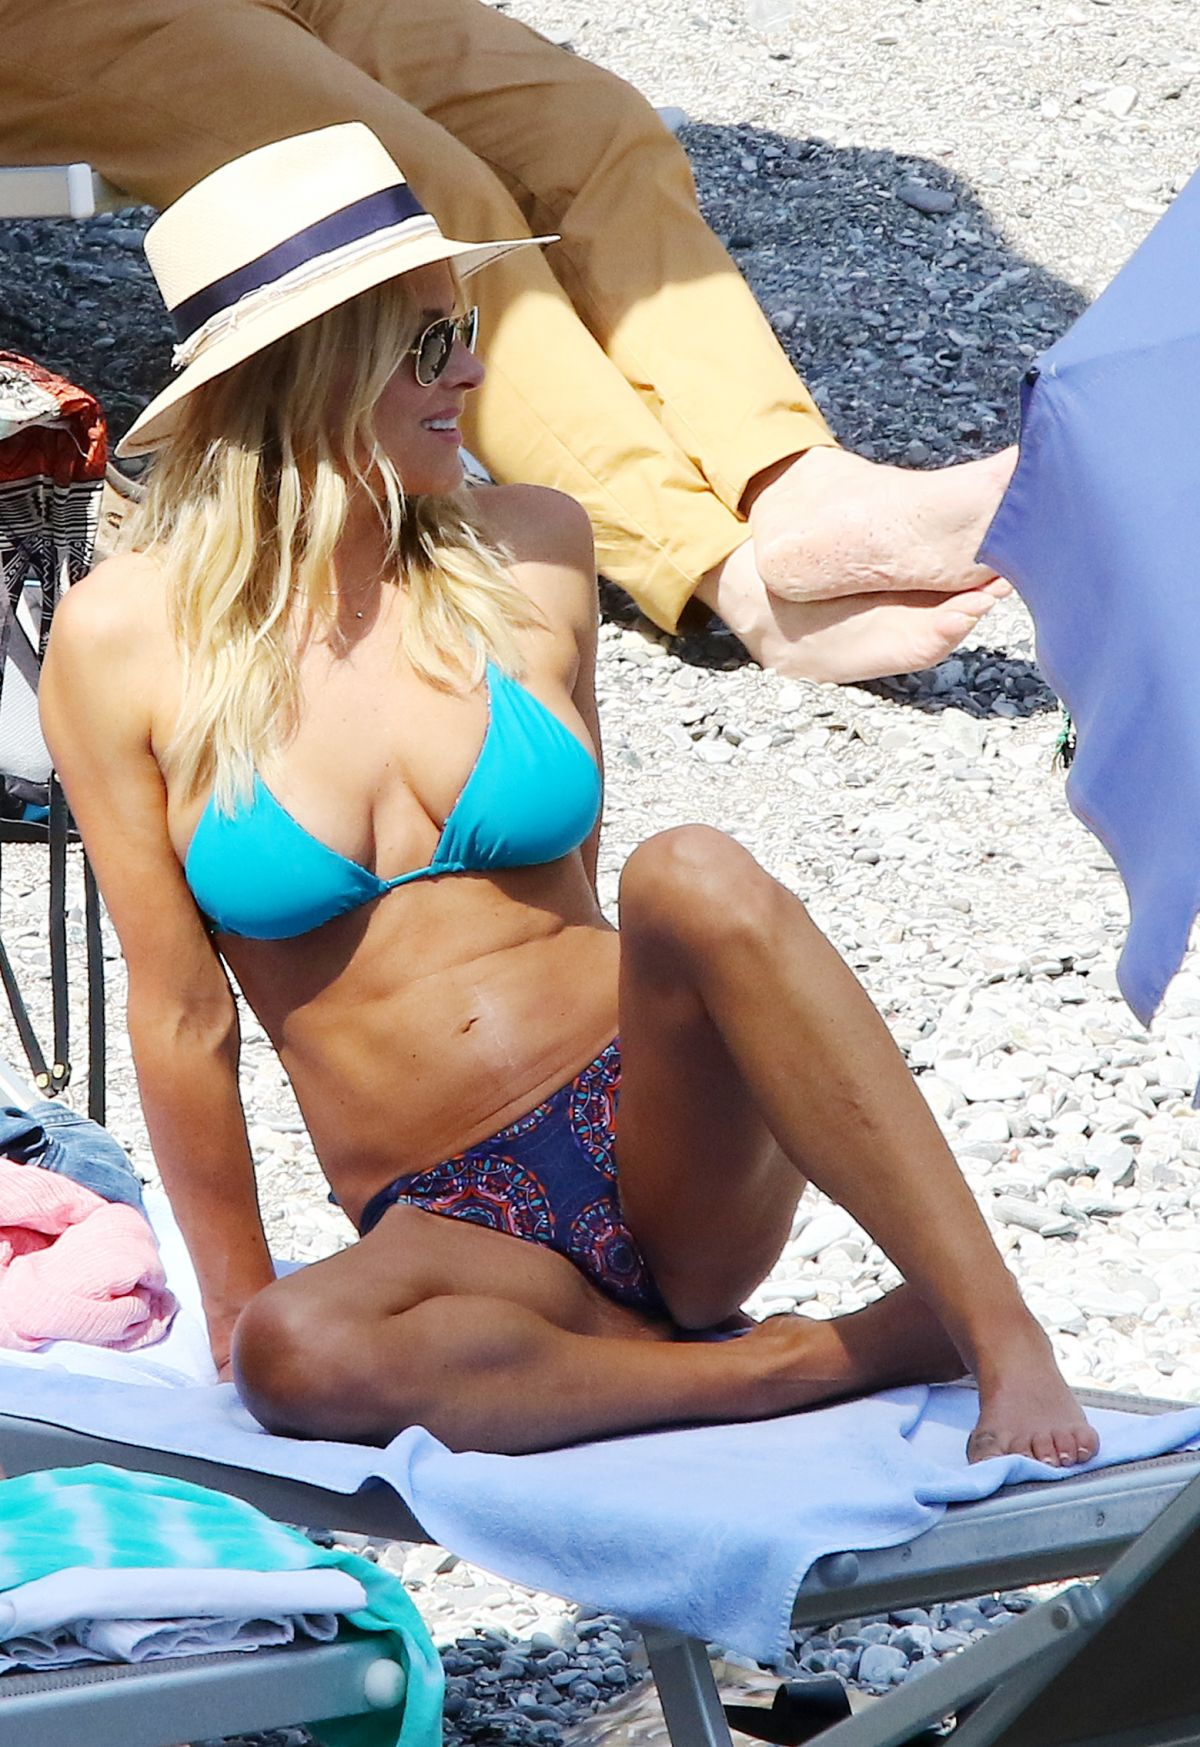 brittany-daniel-in-bikini-on-the-beach-in-portofino-05-07-2016_1.jpg